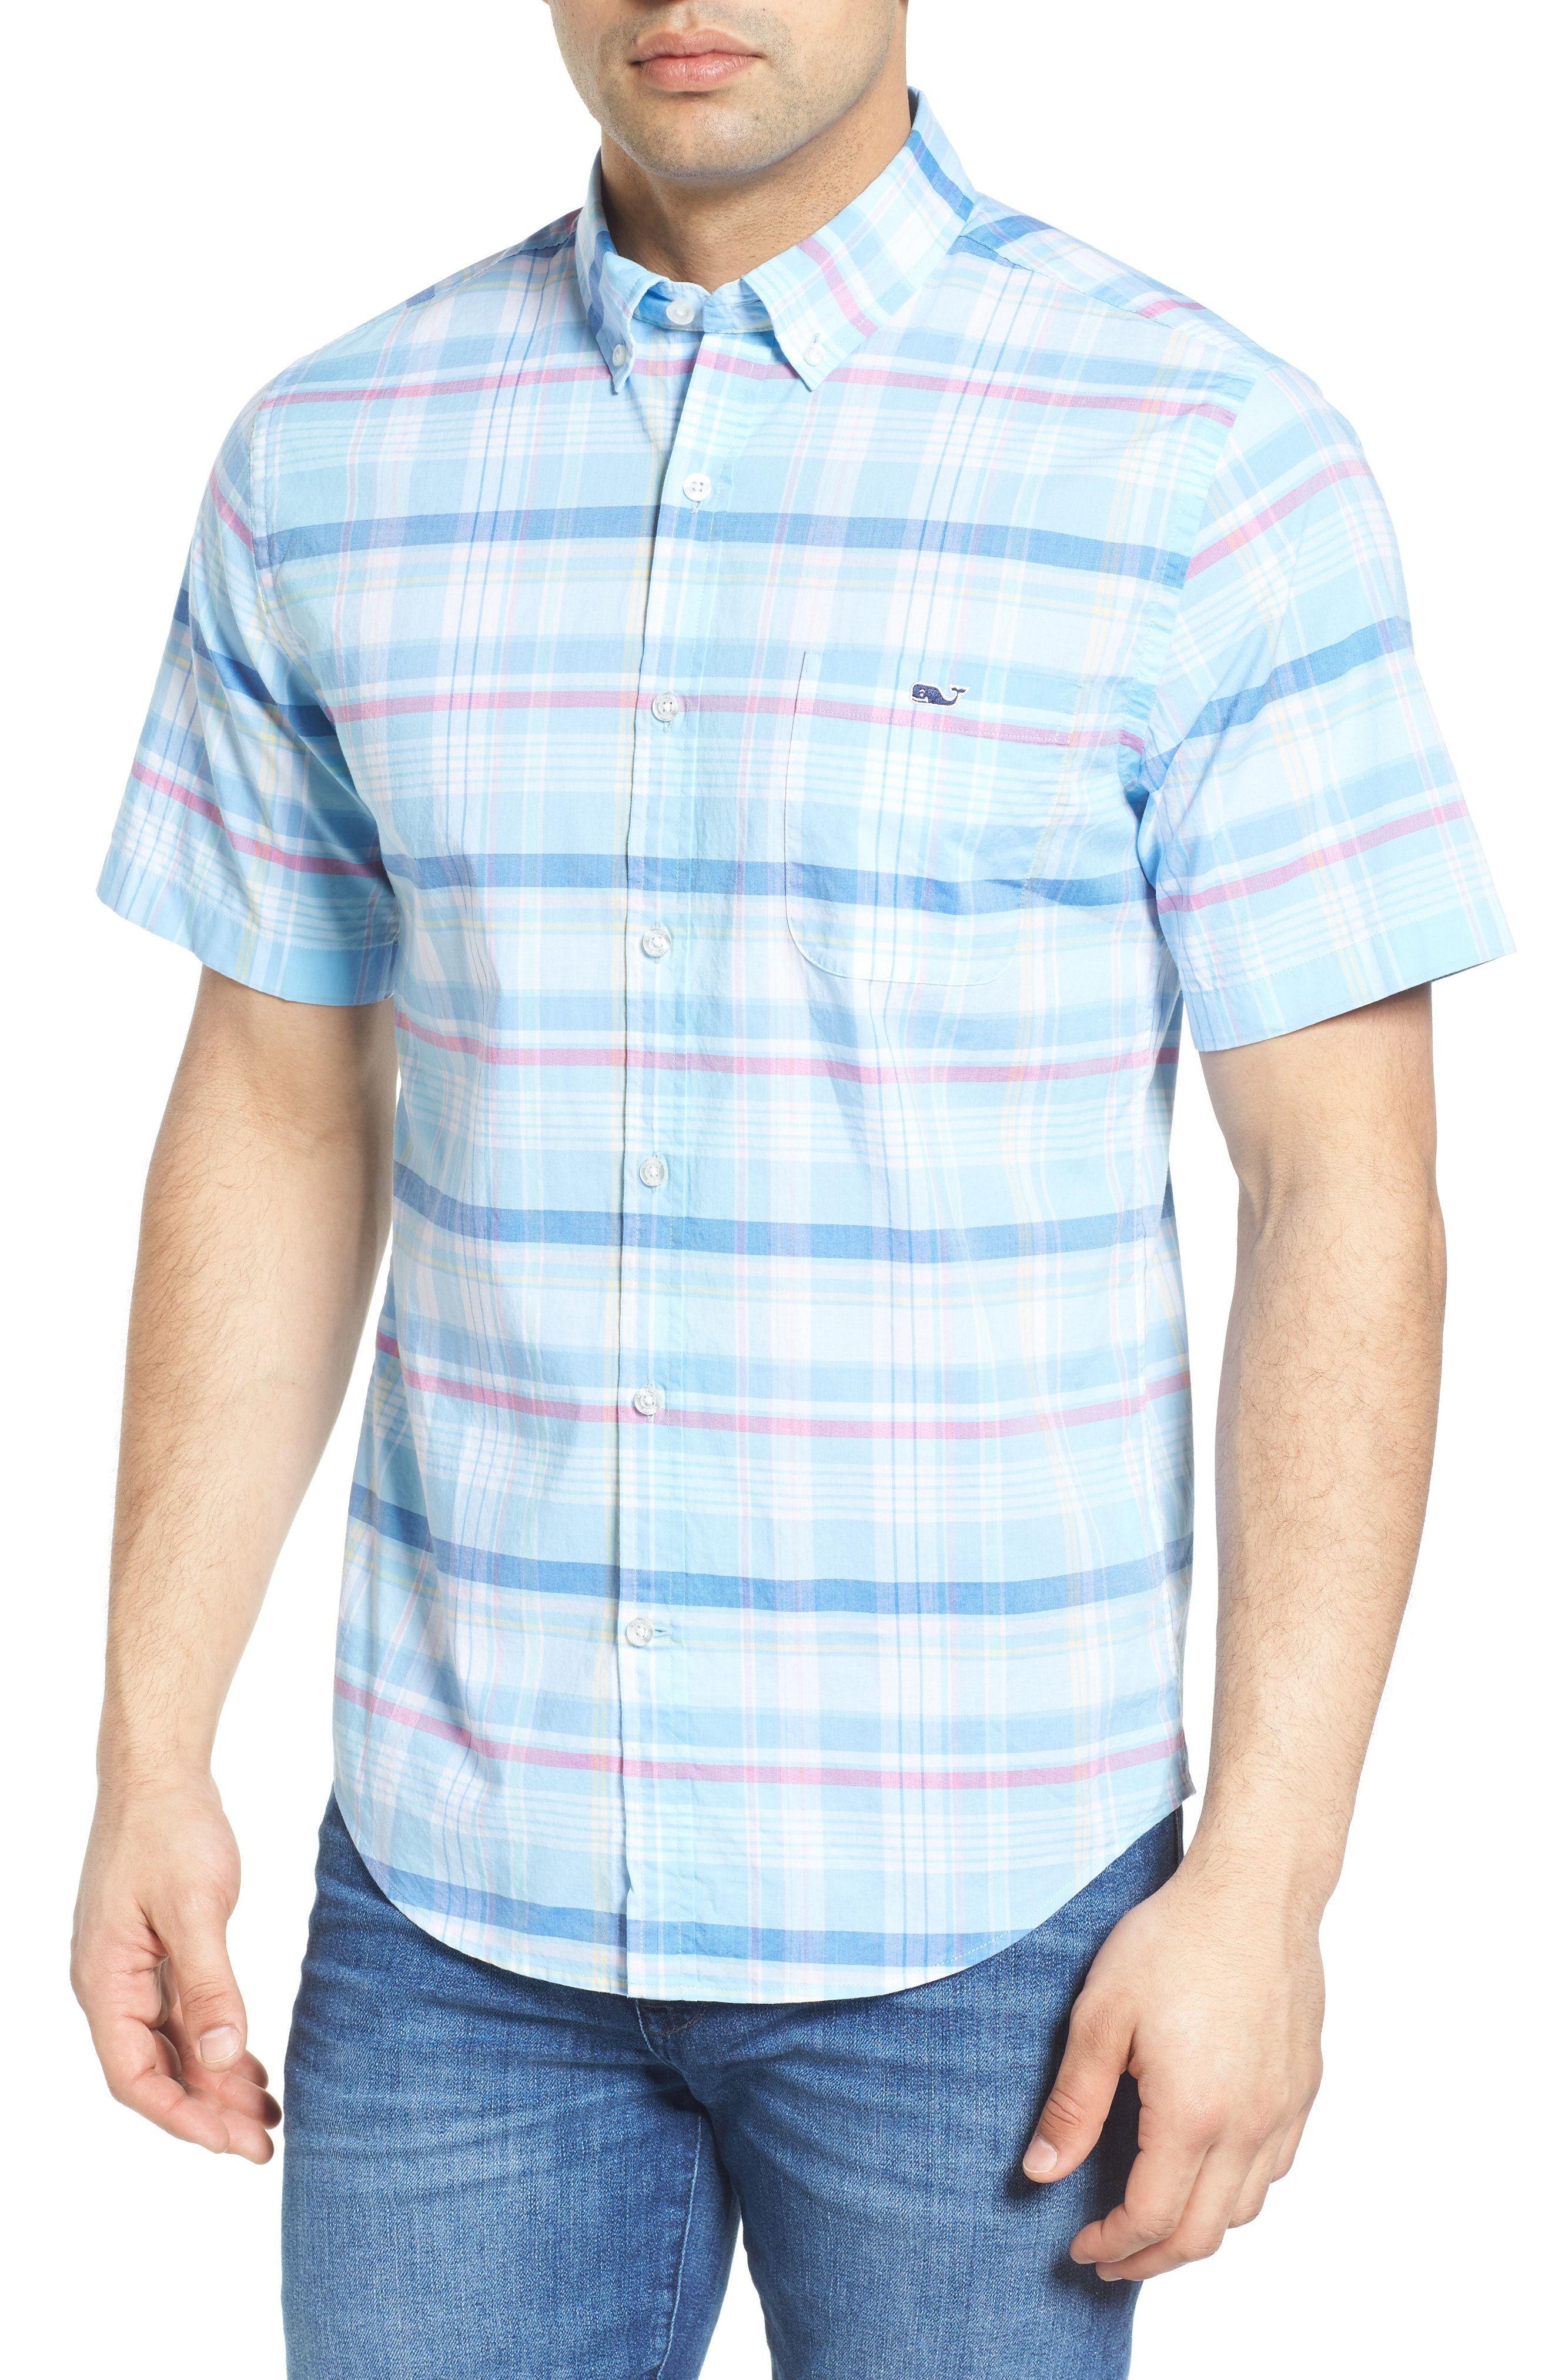 692433ed0 New Vineyard Vines Cedar Point Classic Fit Plaid Sport Shirt ,BERRY fashion  online. [